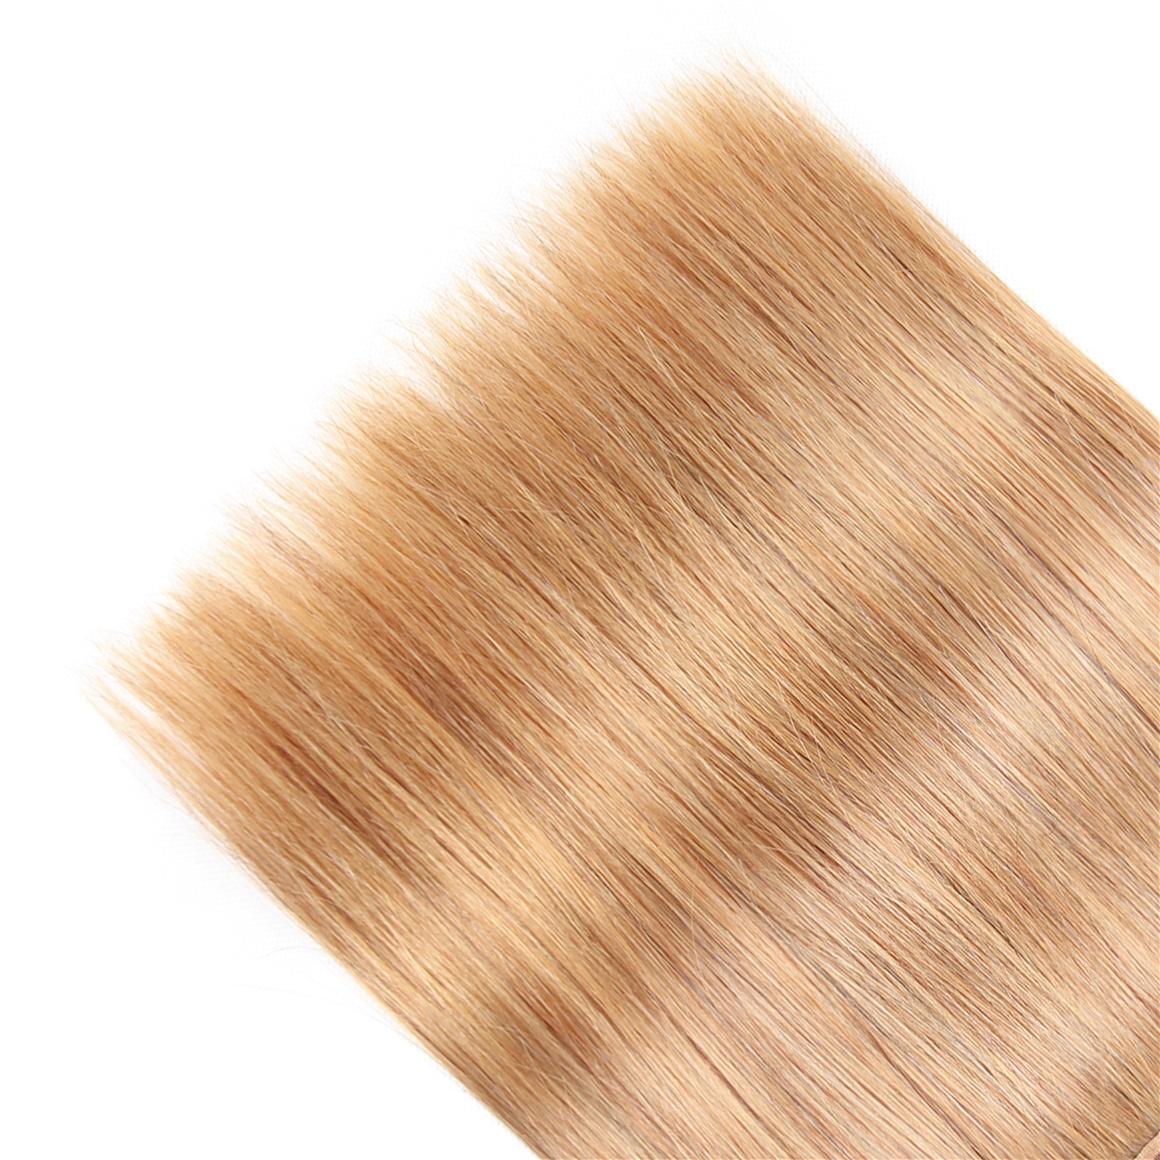 #27 Honey Blonde Body Wave Weaves